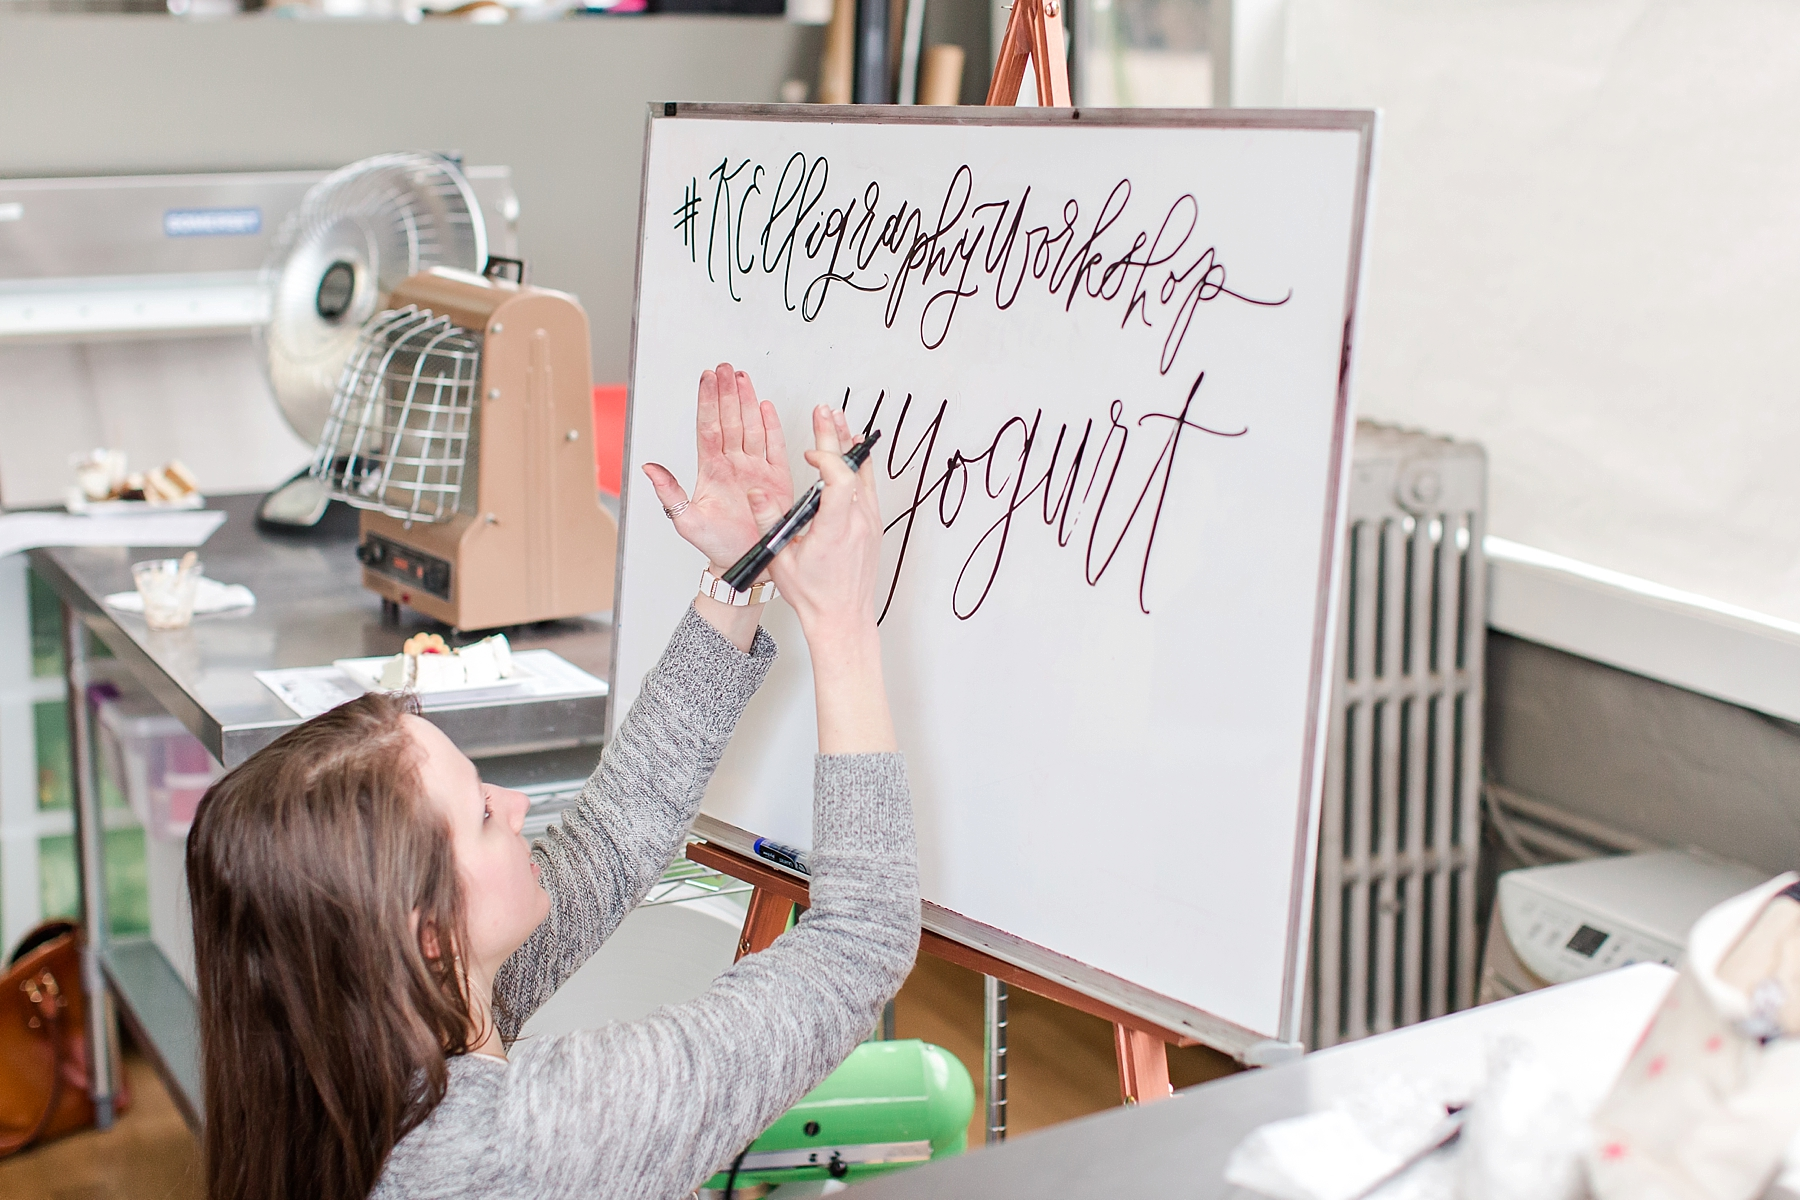 seattle-calligraphy-workshop_0013.jpg